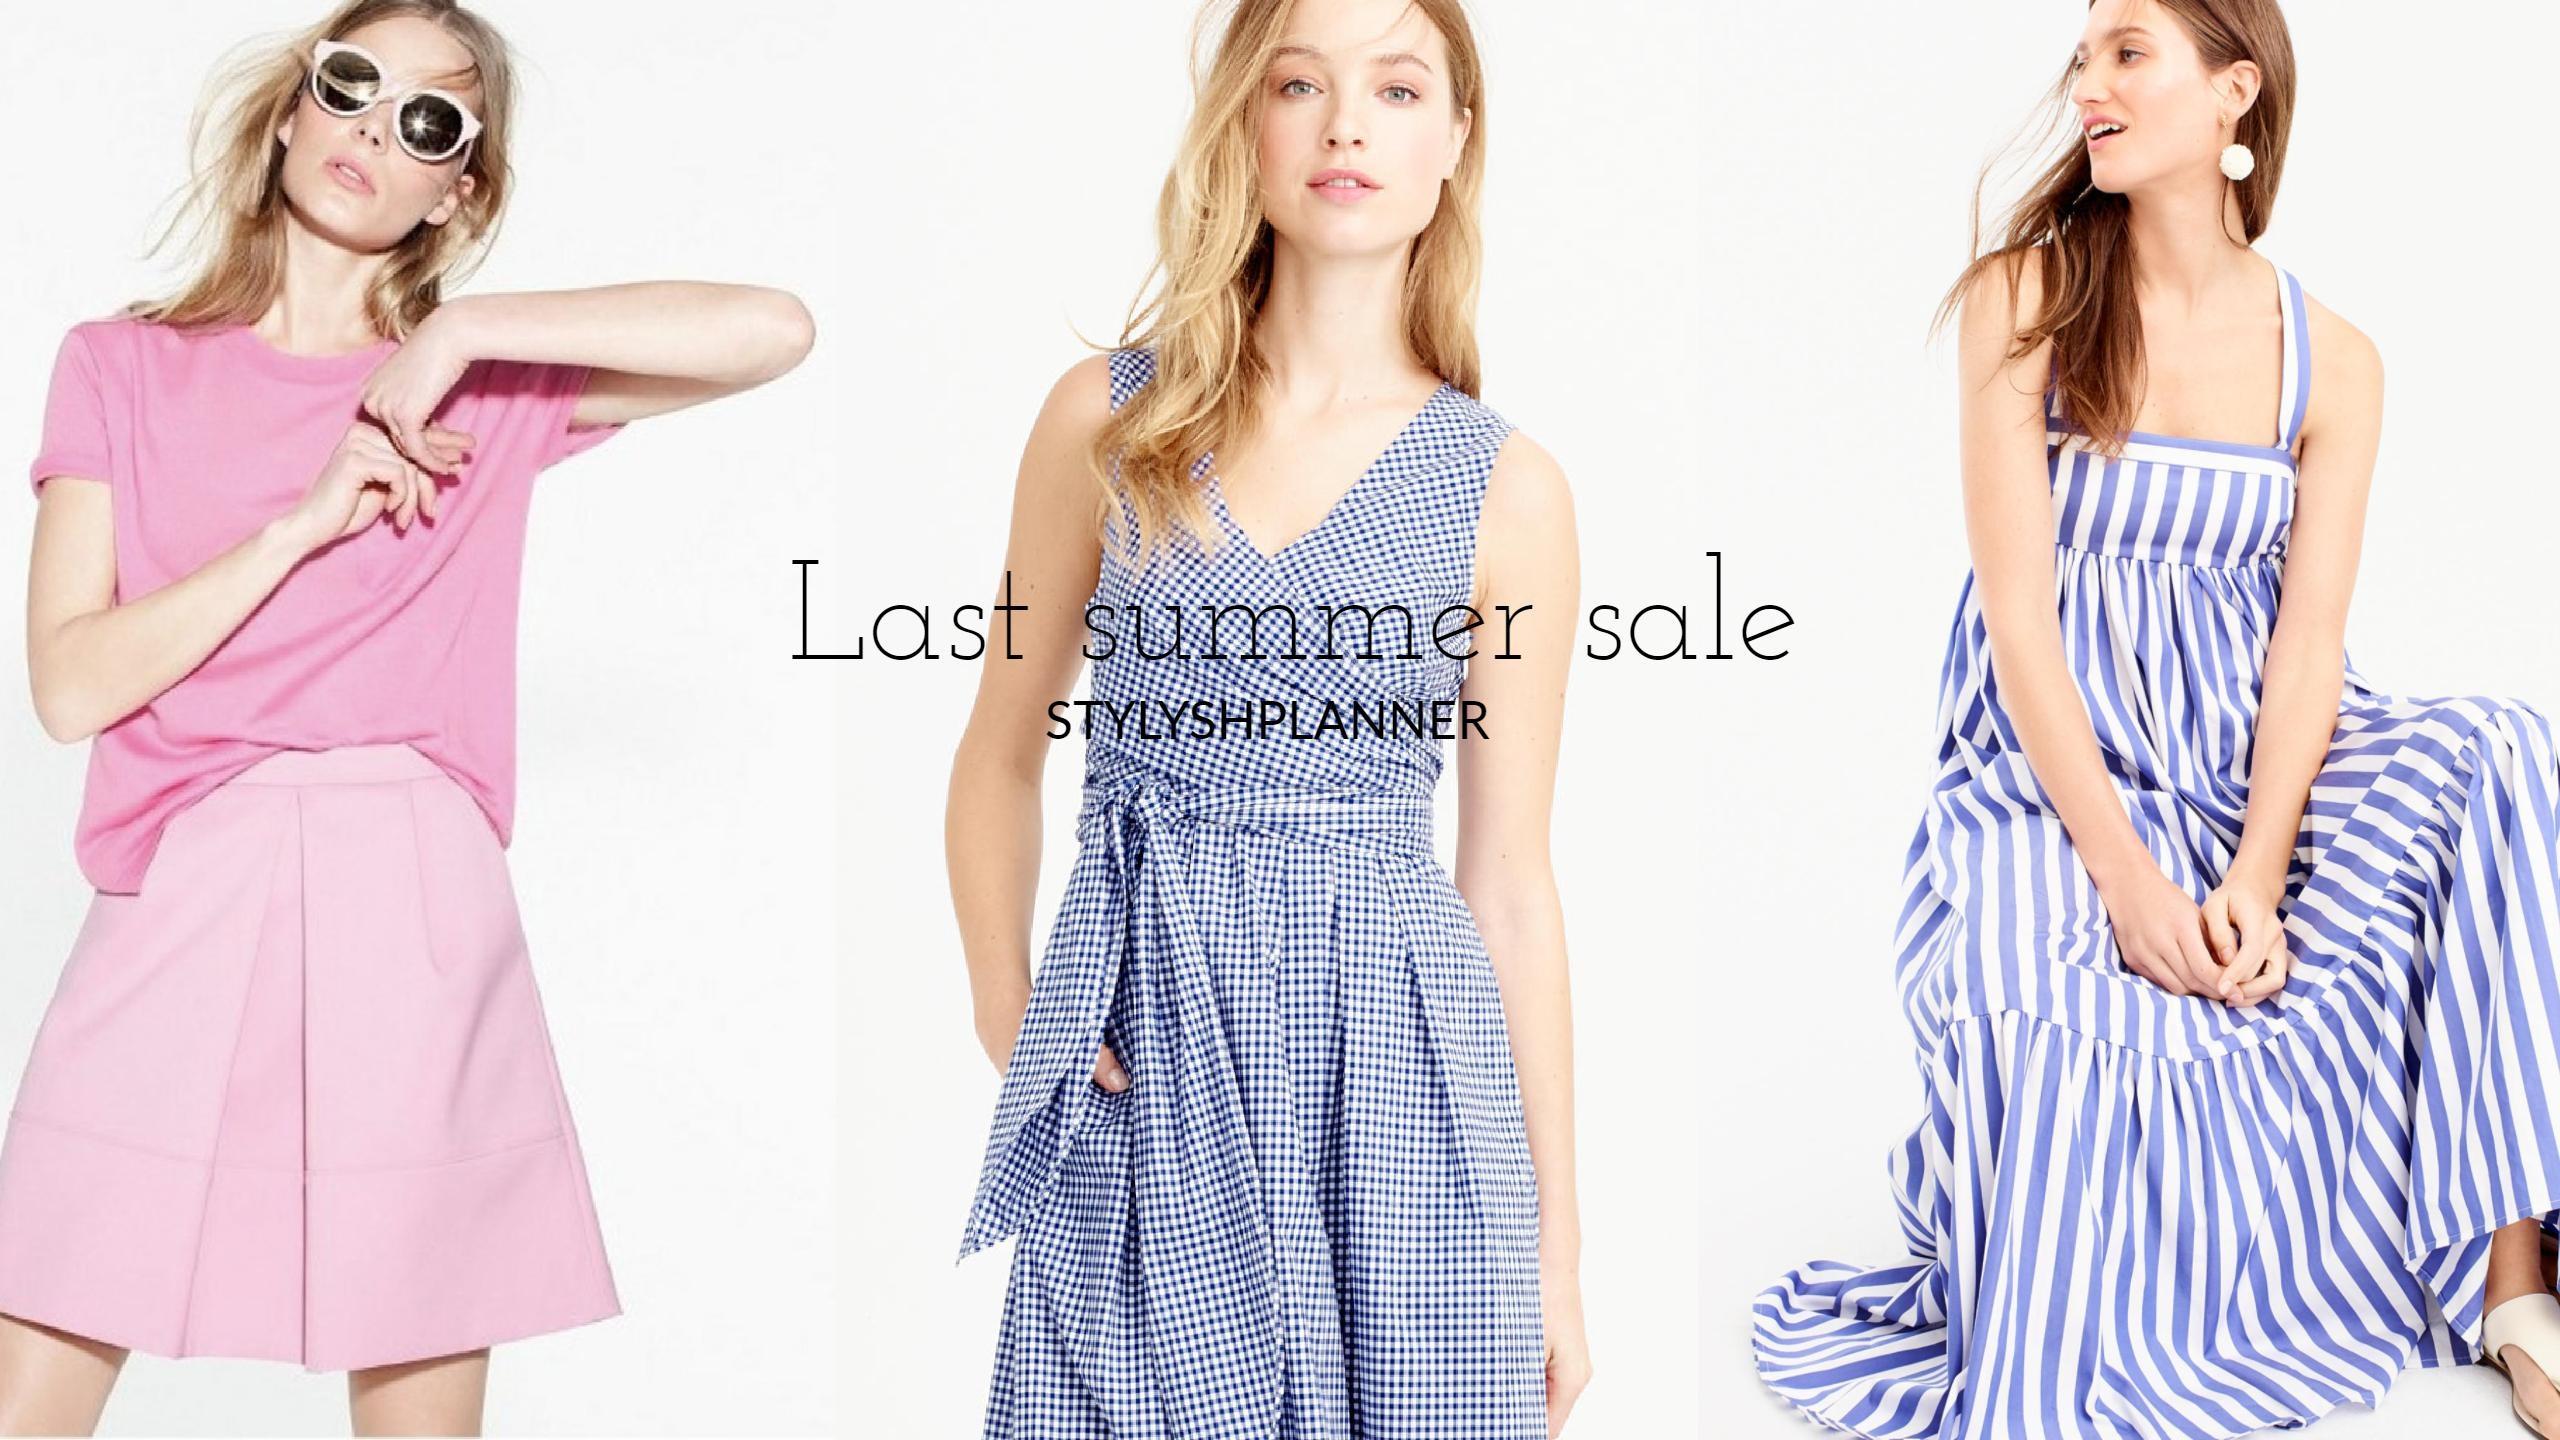 Last summer sales